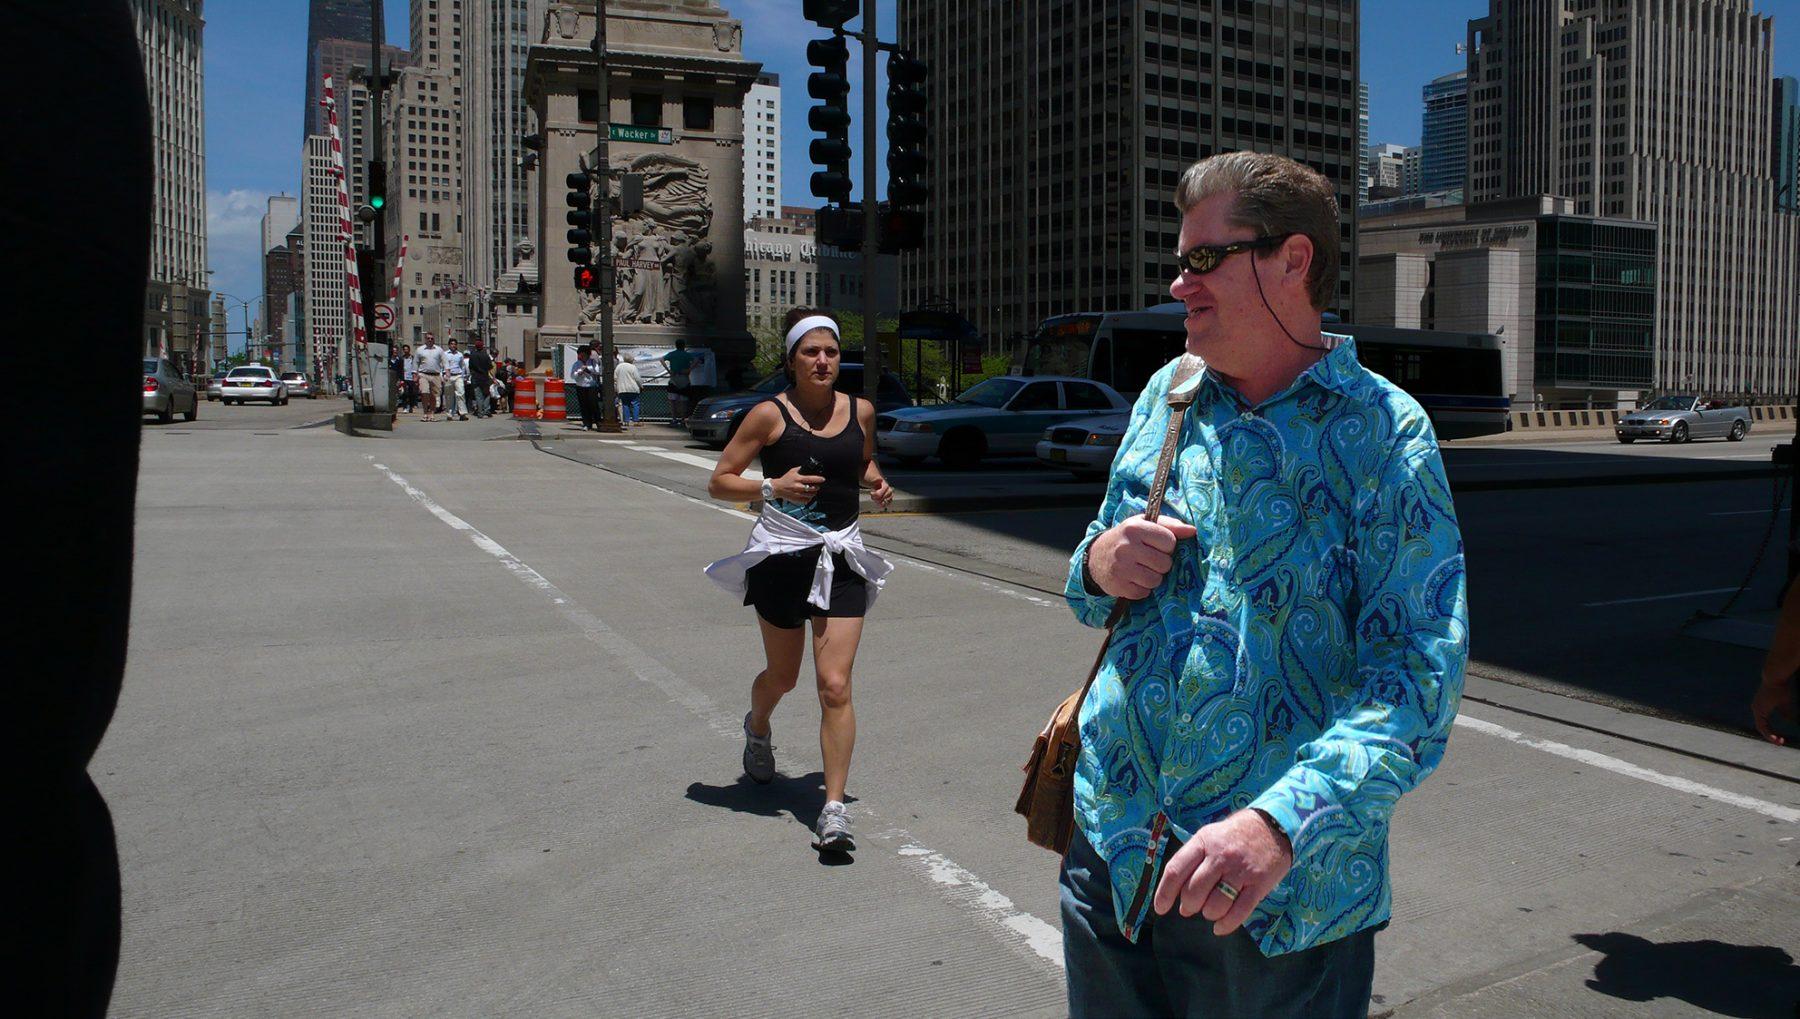 Chicago läufer